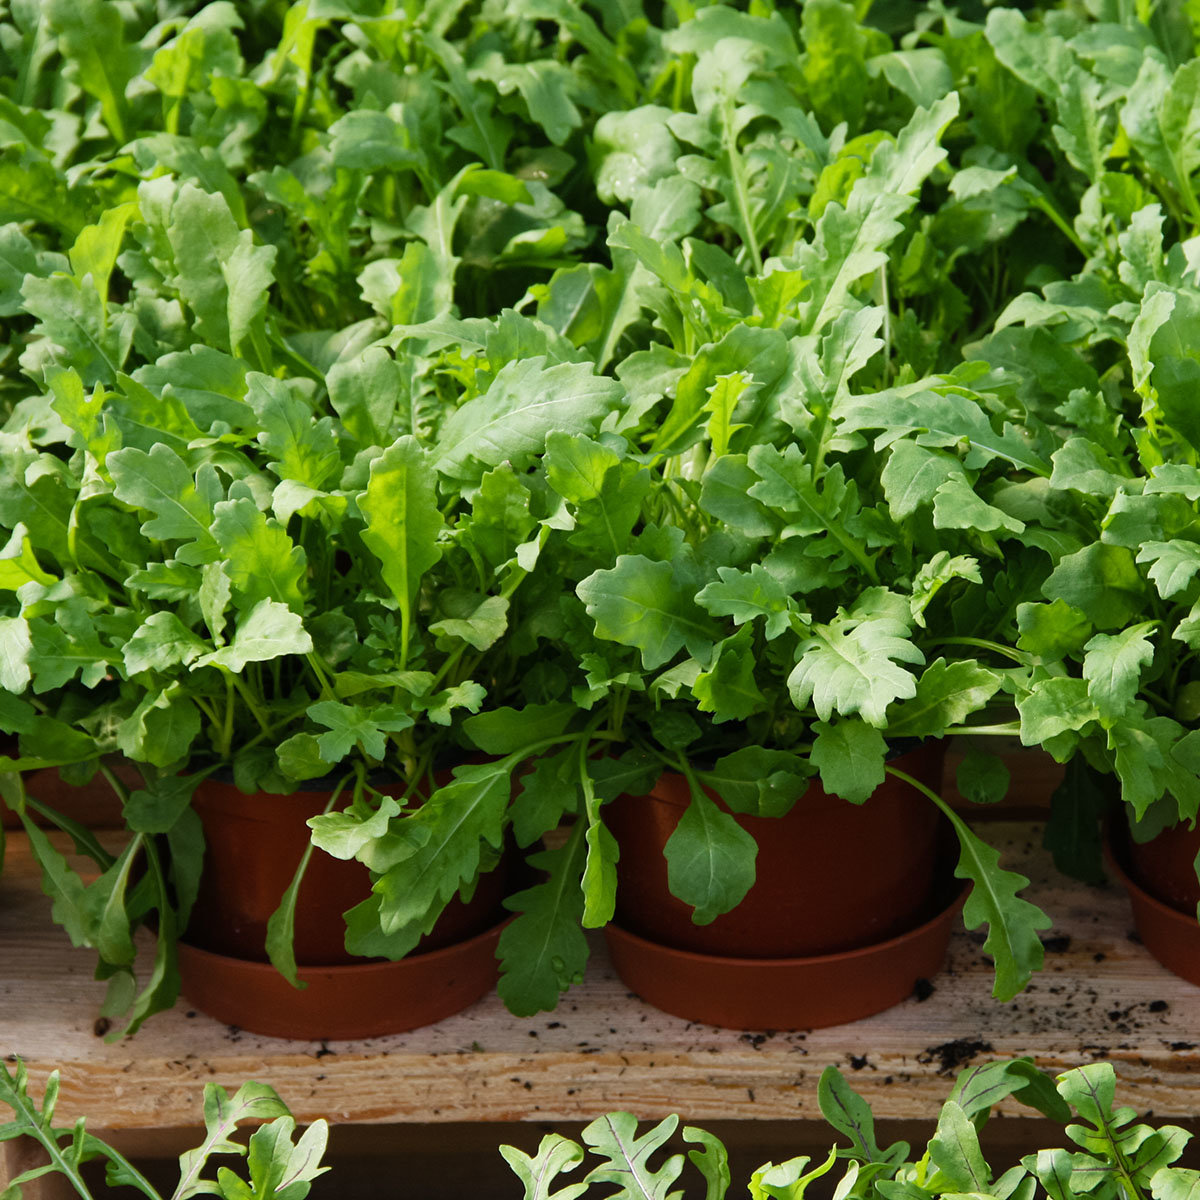 Rucolasamen Simply Salad Arugula, Multi-Pellets | #2